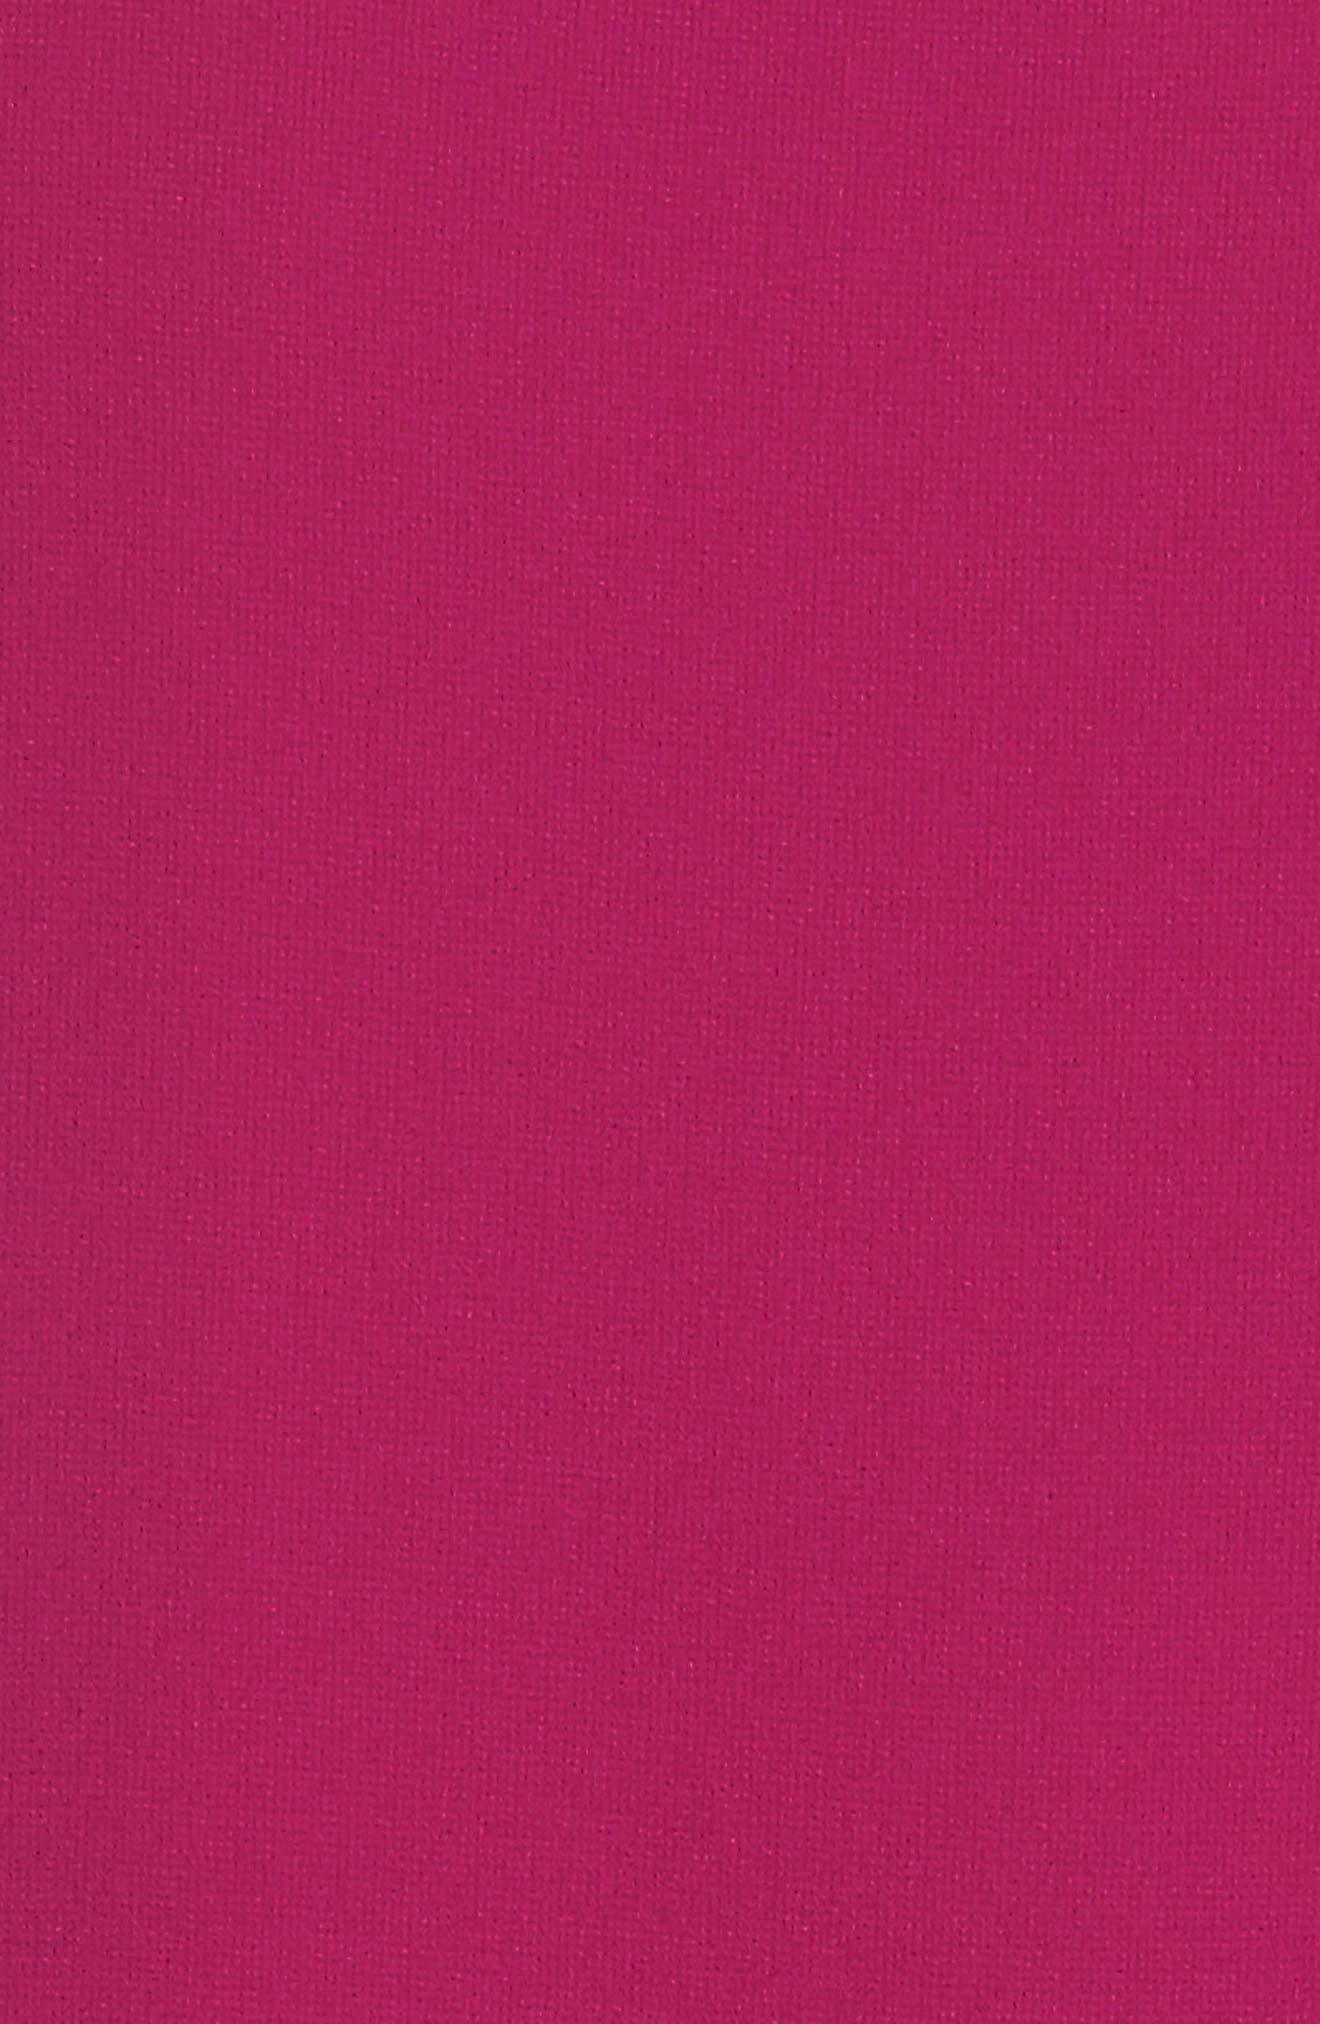 Ruffle Chiffon Shift Dress,                             Alternate thumbnail 6, color,                             678